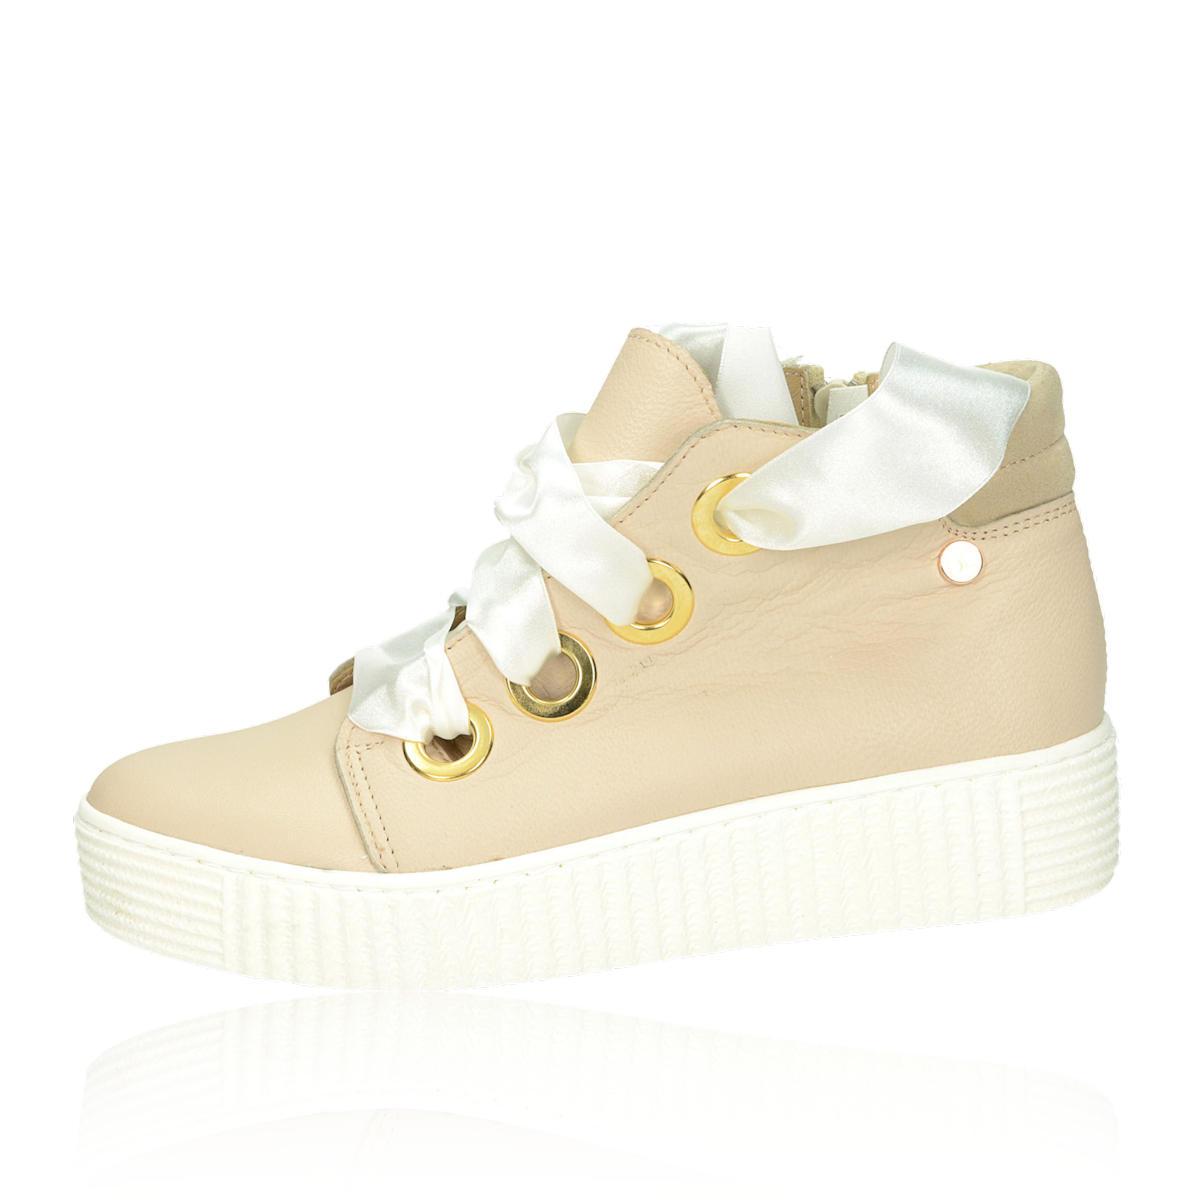 e92b28cc17bd ... Olivia shoes dámske štýlové tenisky na platforme - béžové ...